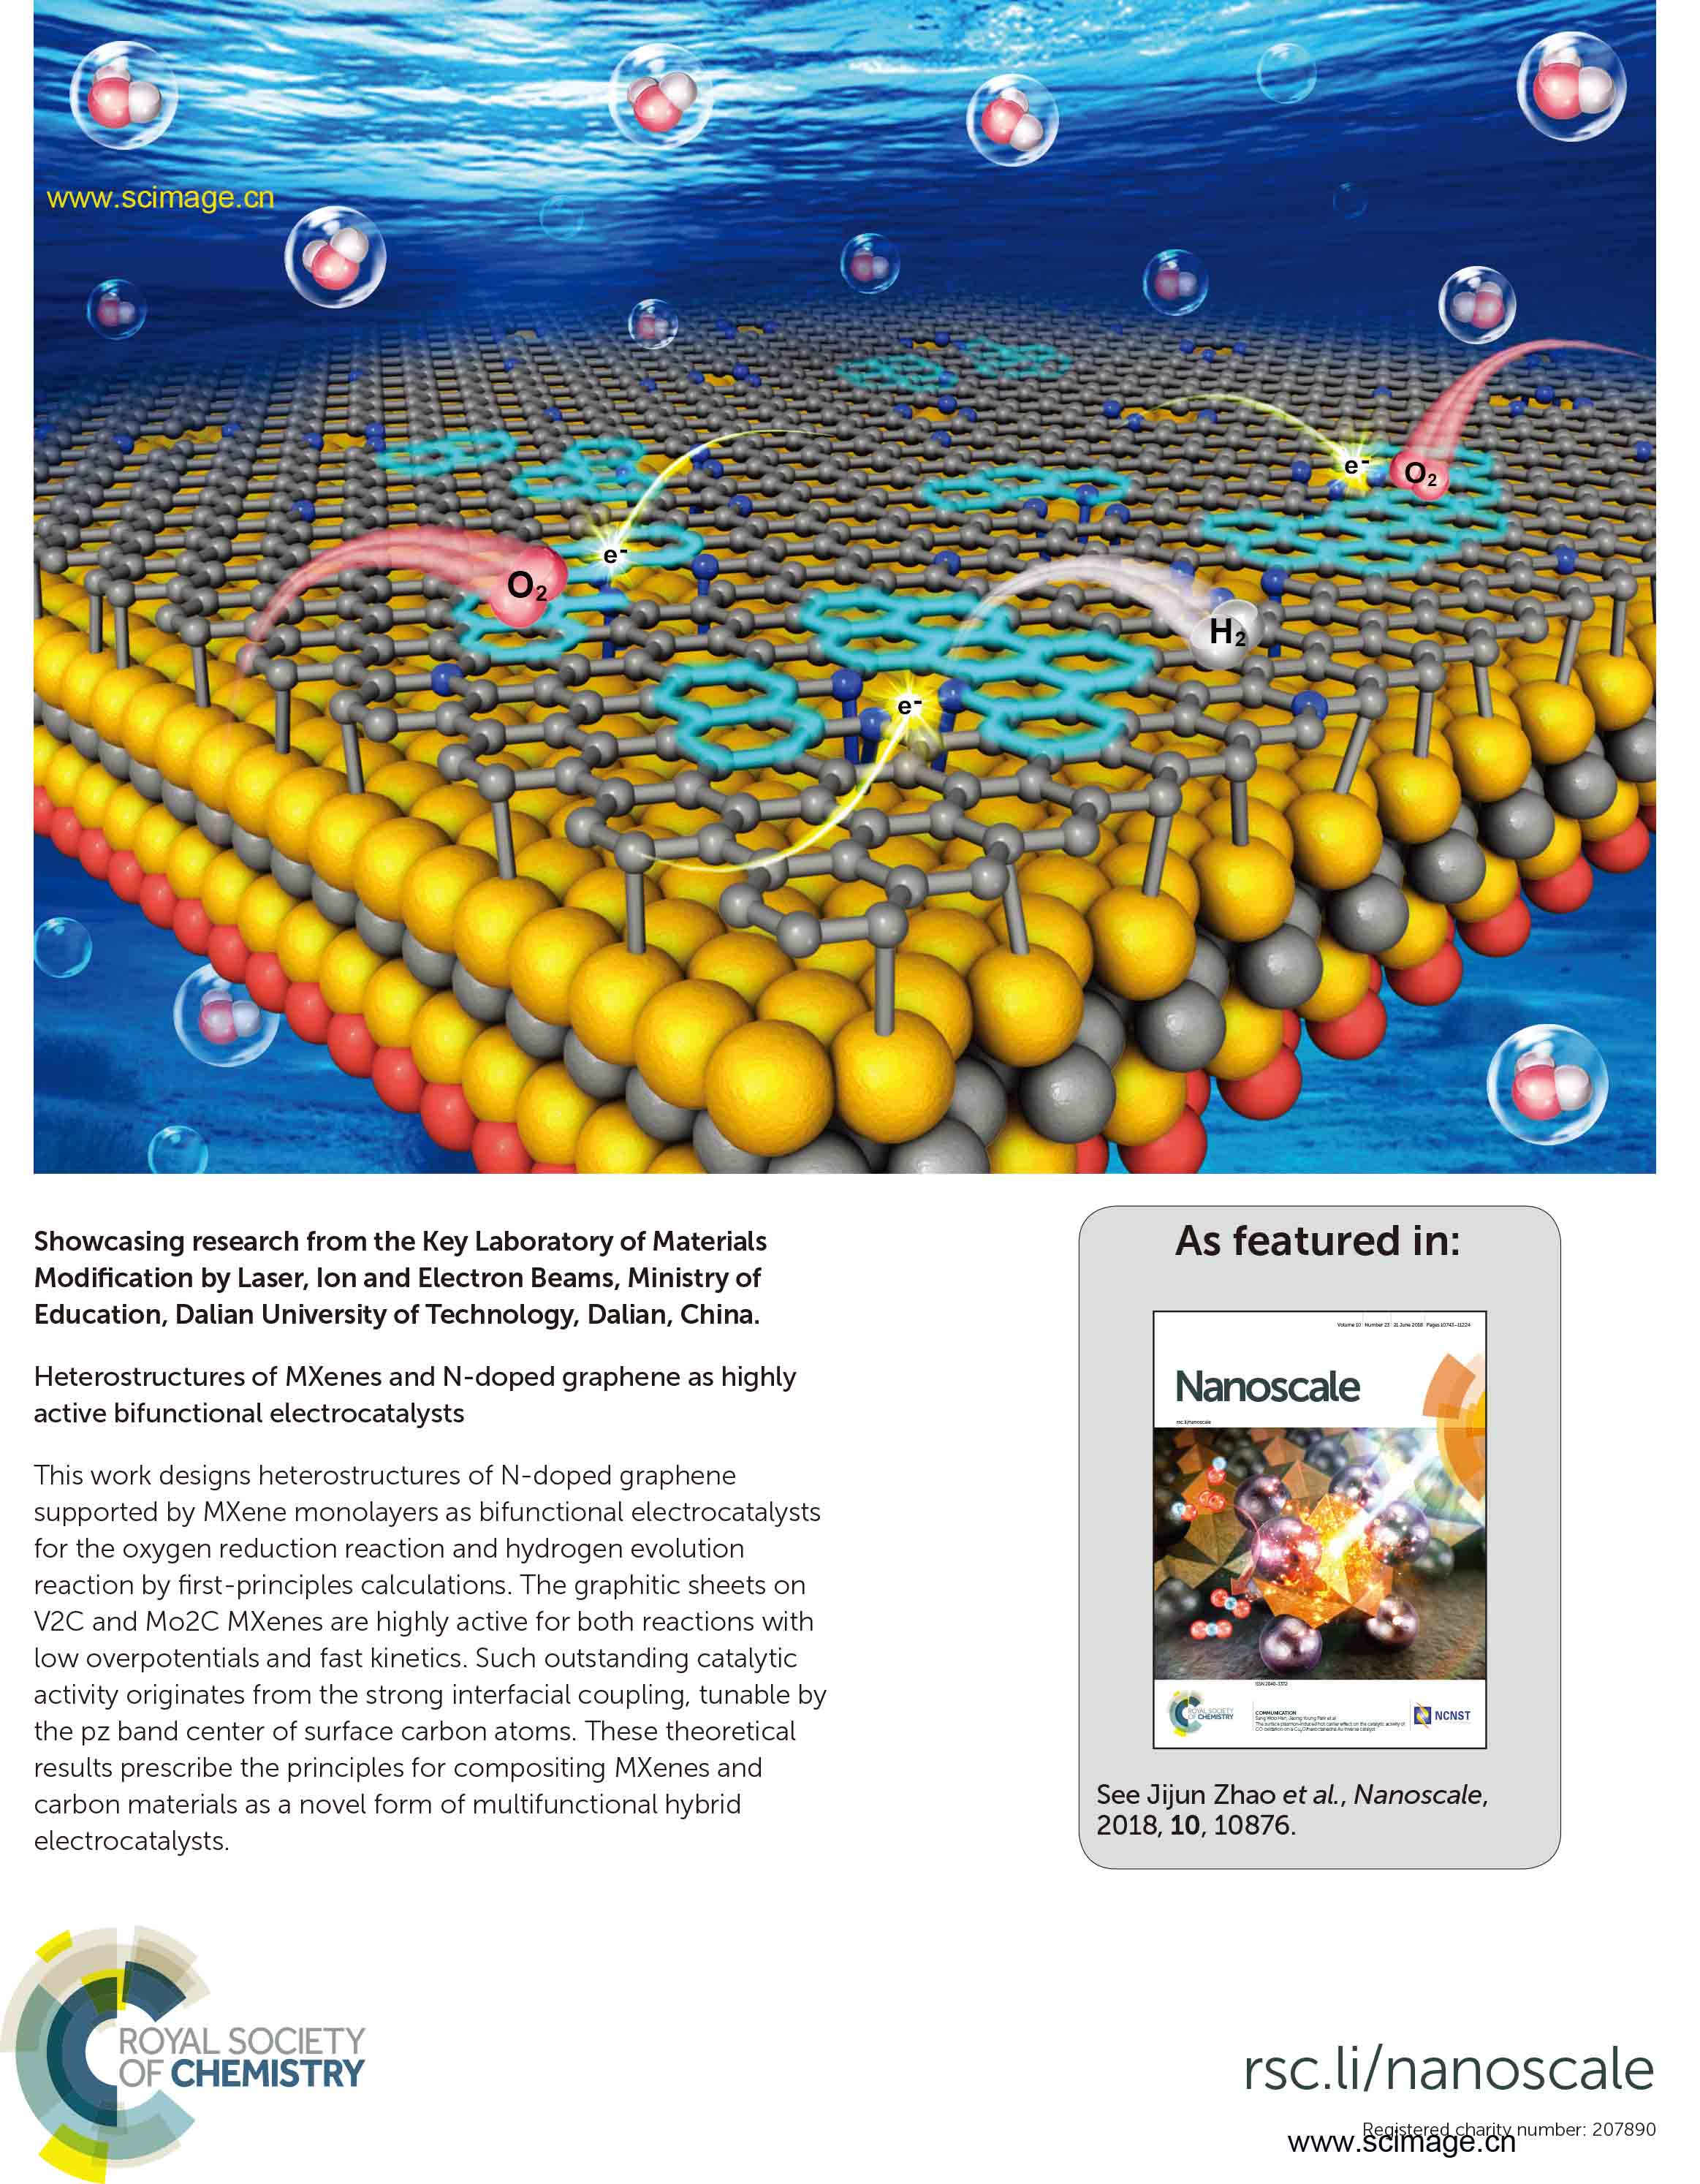 Heterostructures of MXenes and N-doped graphene as highly active bifunctional electrocatalysts